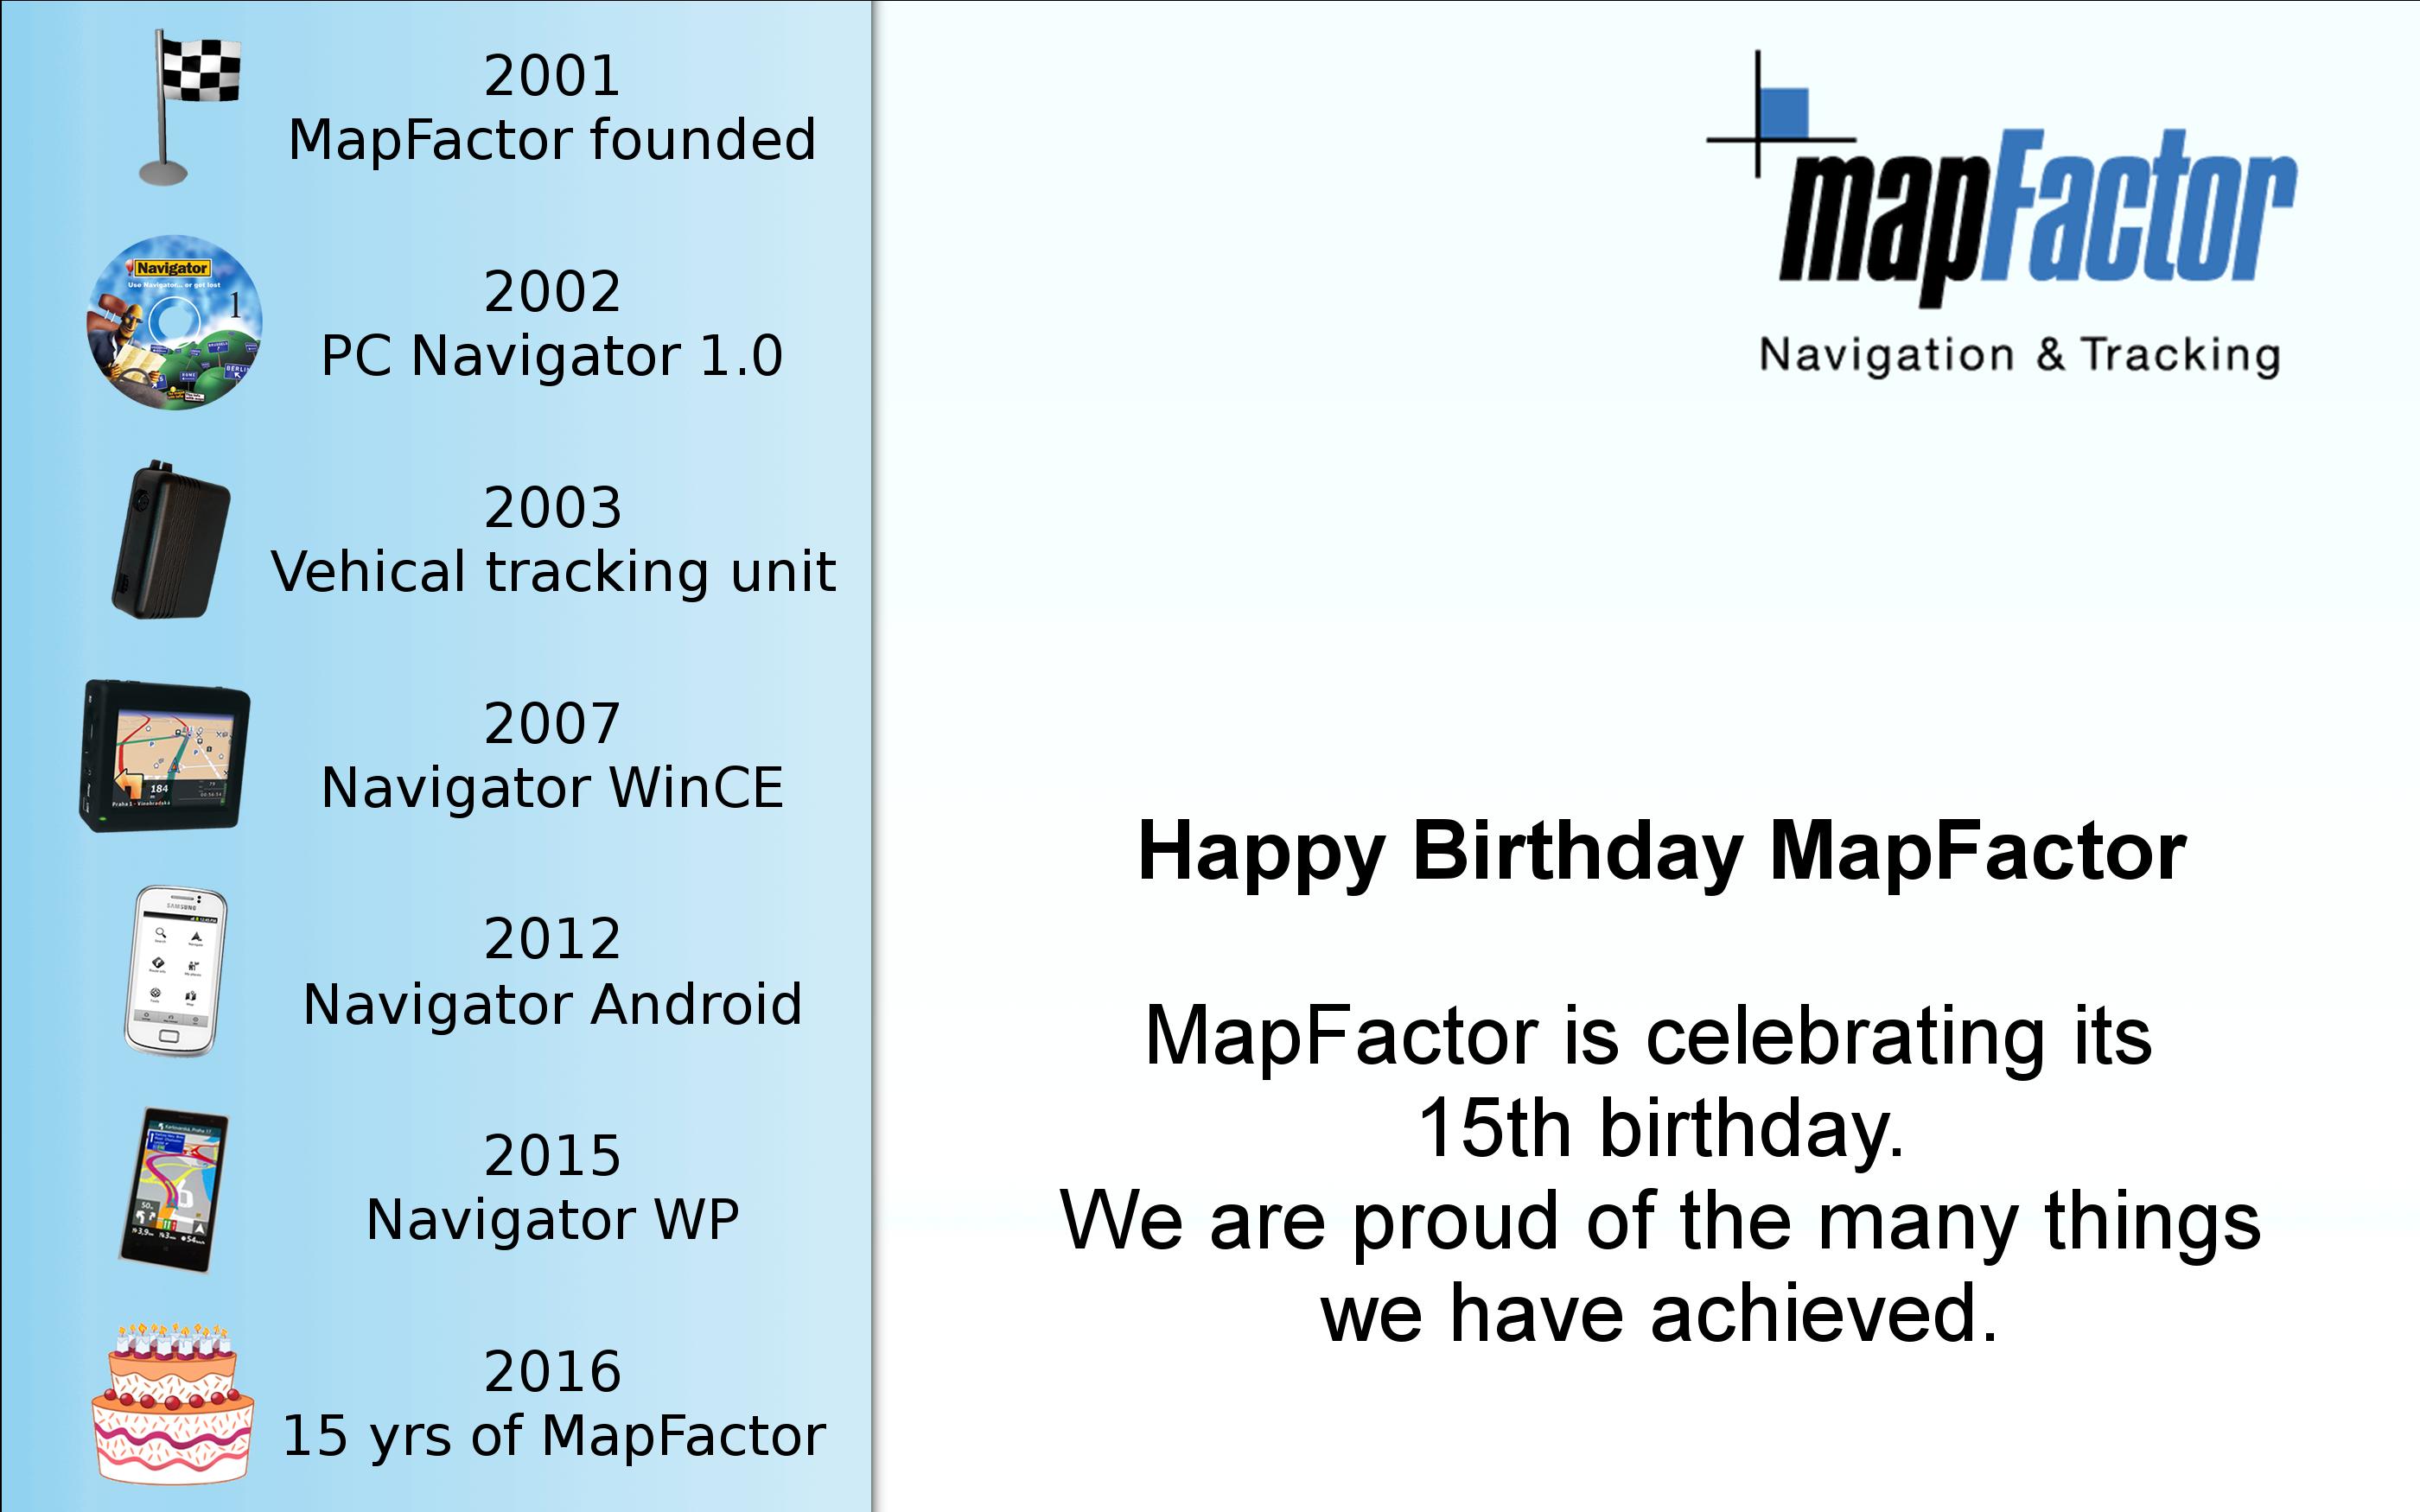 15 years of MapFactor